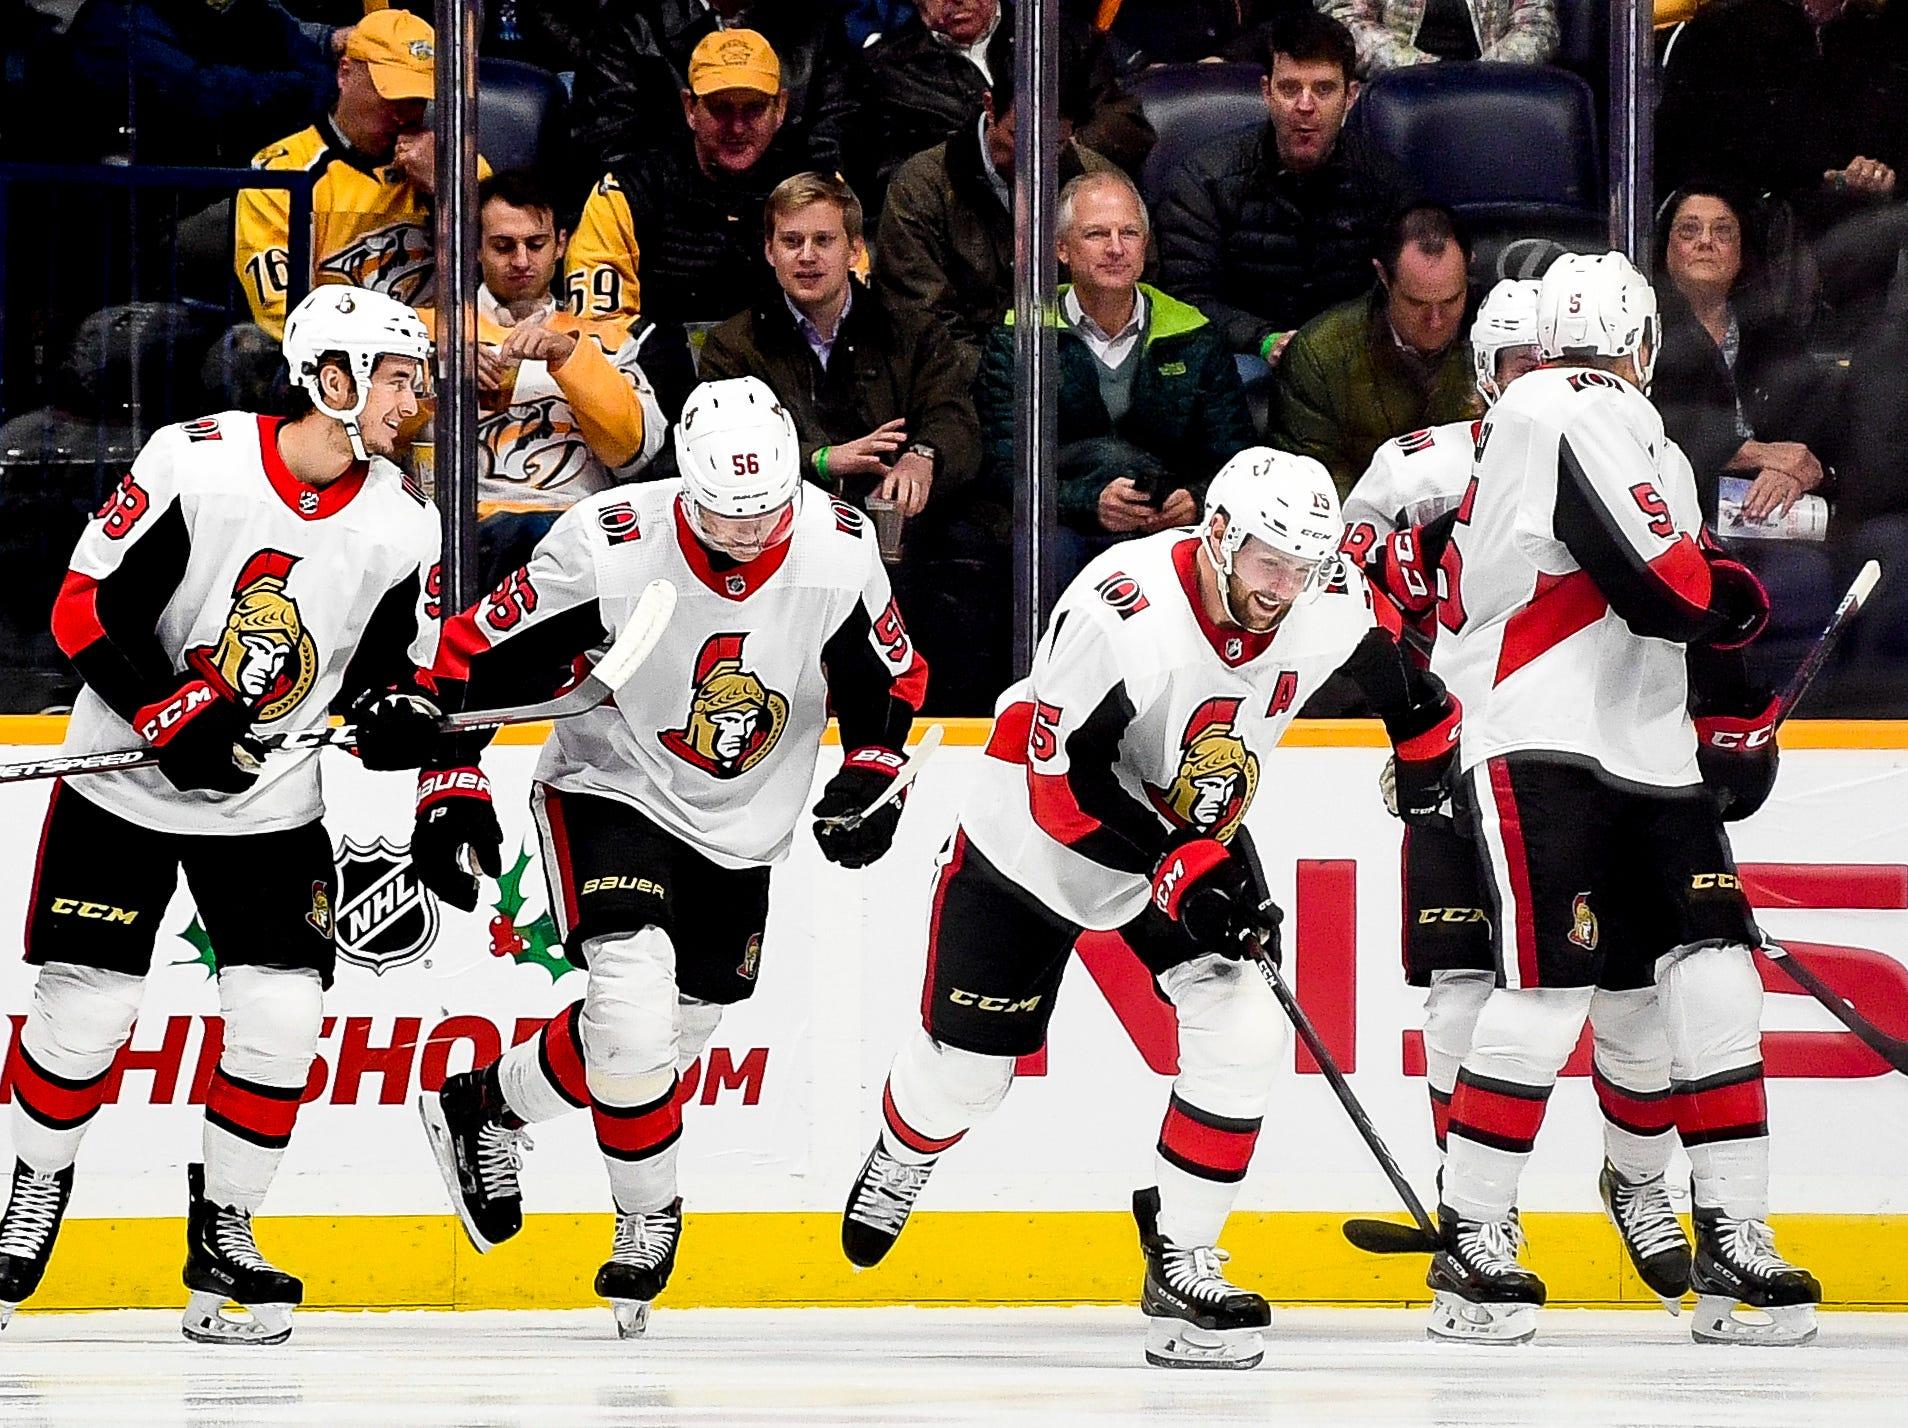 Ottawa Senators left wing Zack Smith (15) smiles after scoring against the Nashville Predators during the first period at Bridgestone Arena in Nashville, Tenn., Tuesday, Dec. 11, 2018.